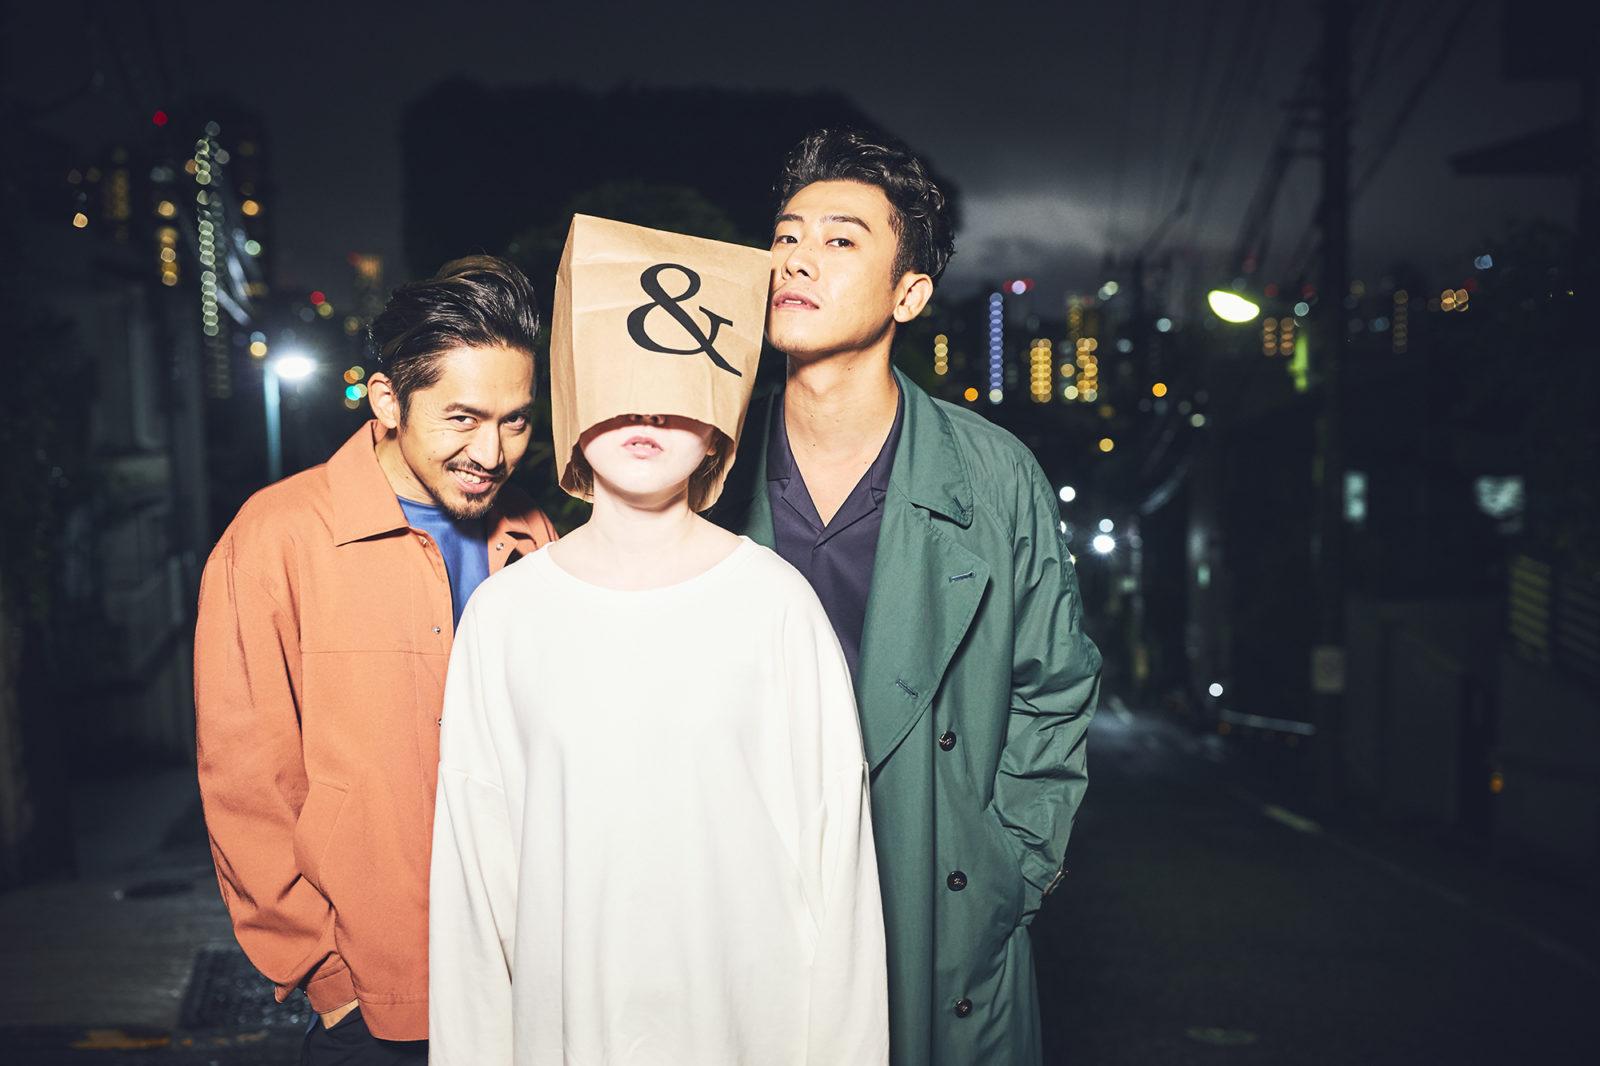 C&K 新曲「嗚呼、麗しき人生」MV、YouTubeプレミアにて7月24日(水)21時より配信決定サムネイル画像